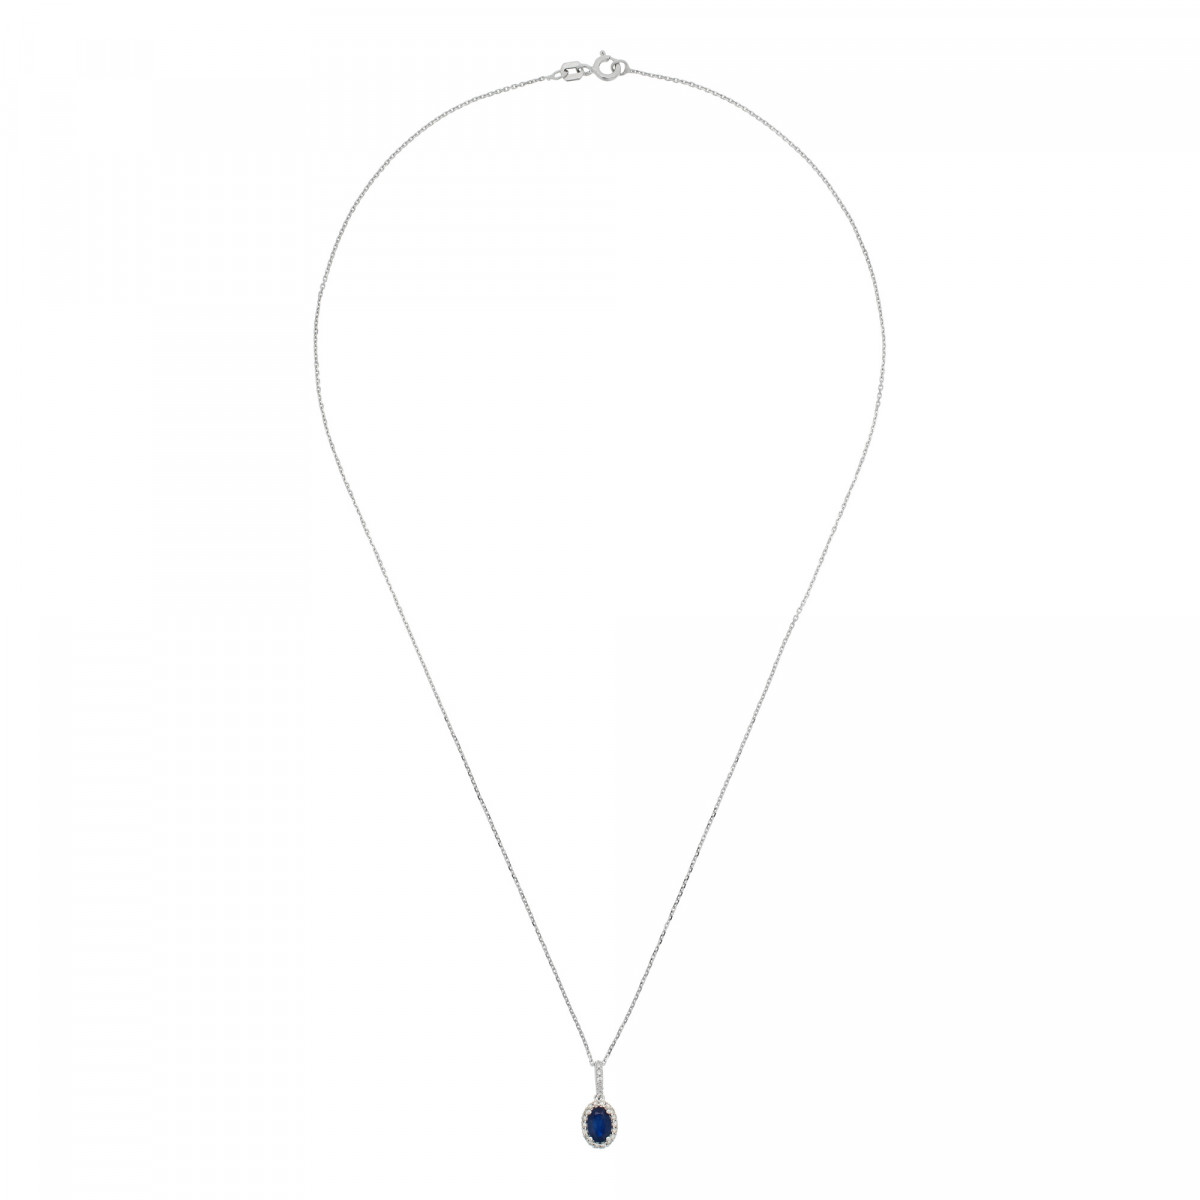 "Pendentif Or Blanc, Diamants 0,09 carat et Saphir 0,6 carat ""COURTOISIE"" + chaîne argent offerte"